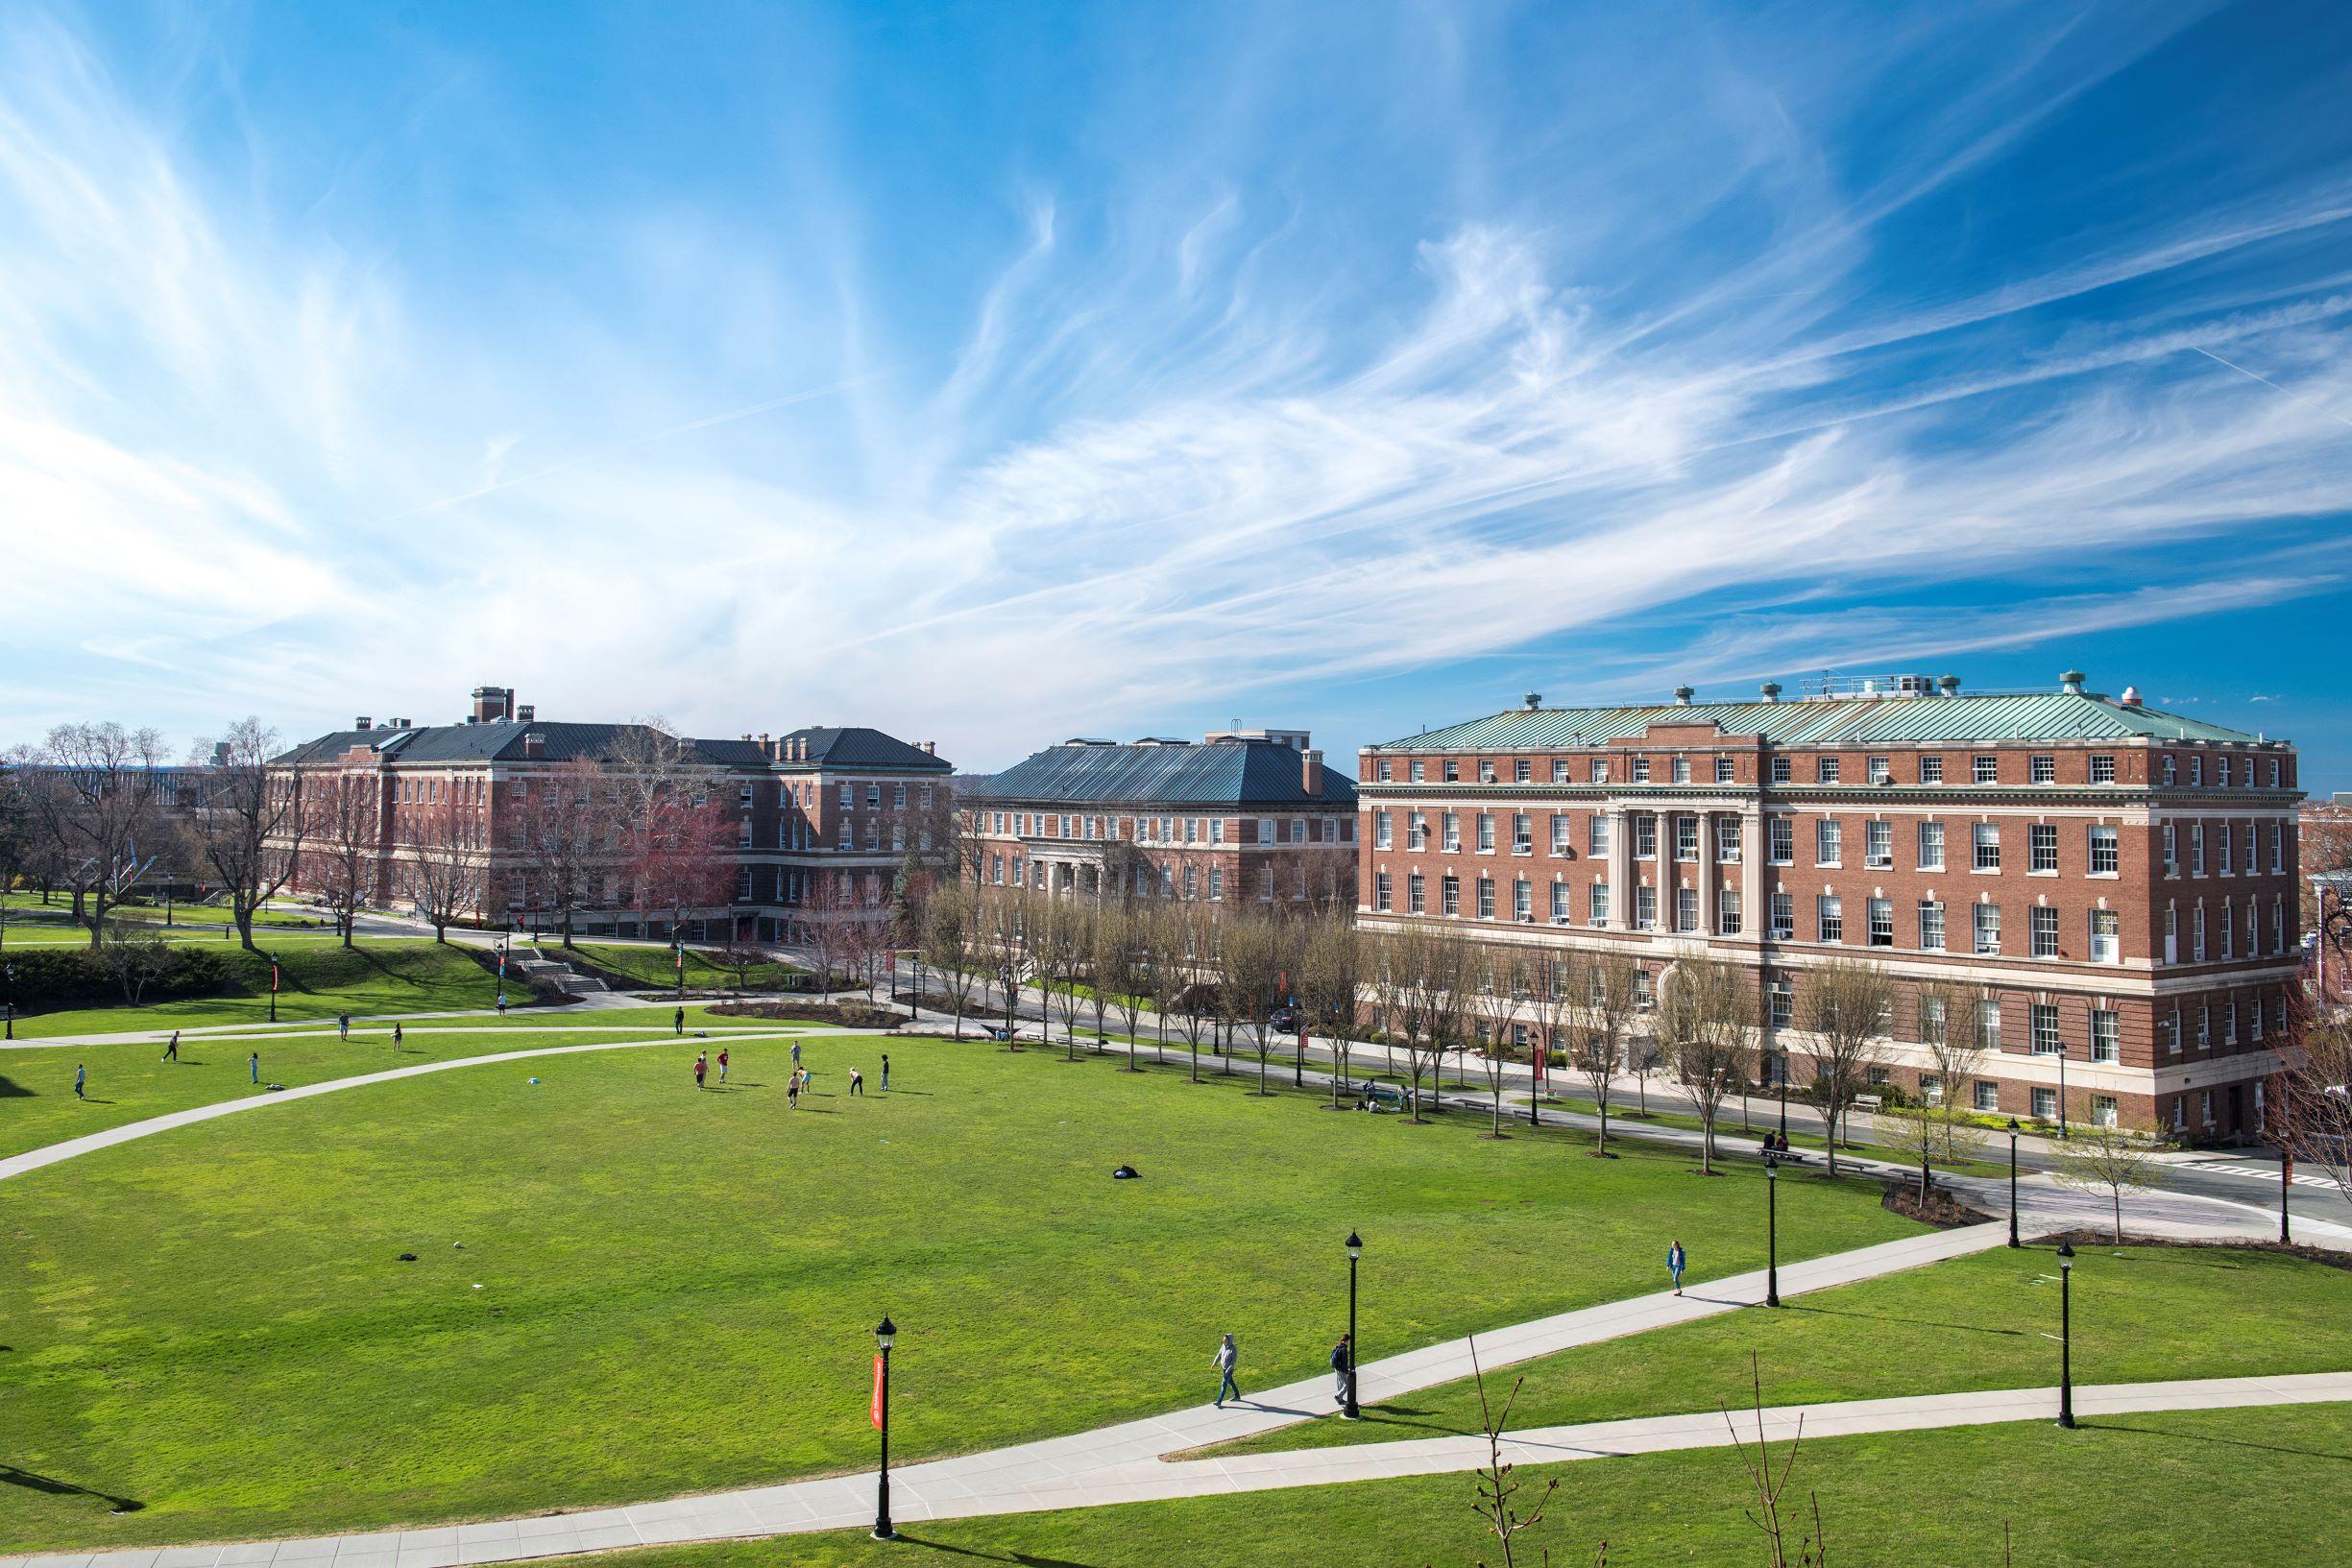 Rensselaer Polytechnic Institute Ranks High In Best Programs intended for Rensselaer Polytechnic Institute Academic Calendar 2020